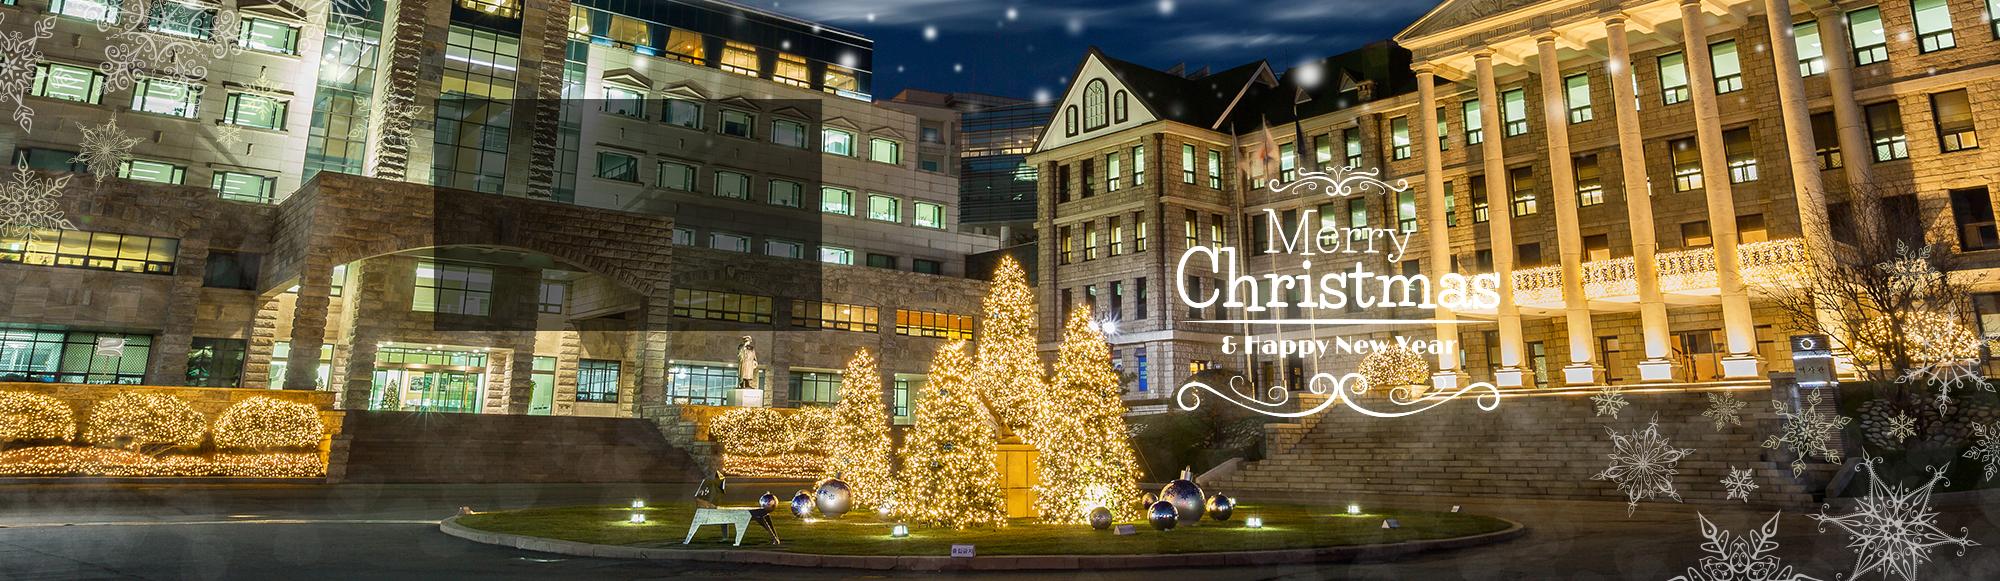 Merry<br>Christmas★